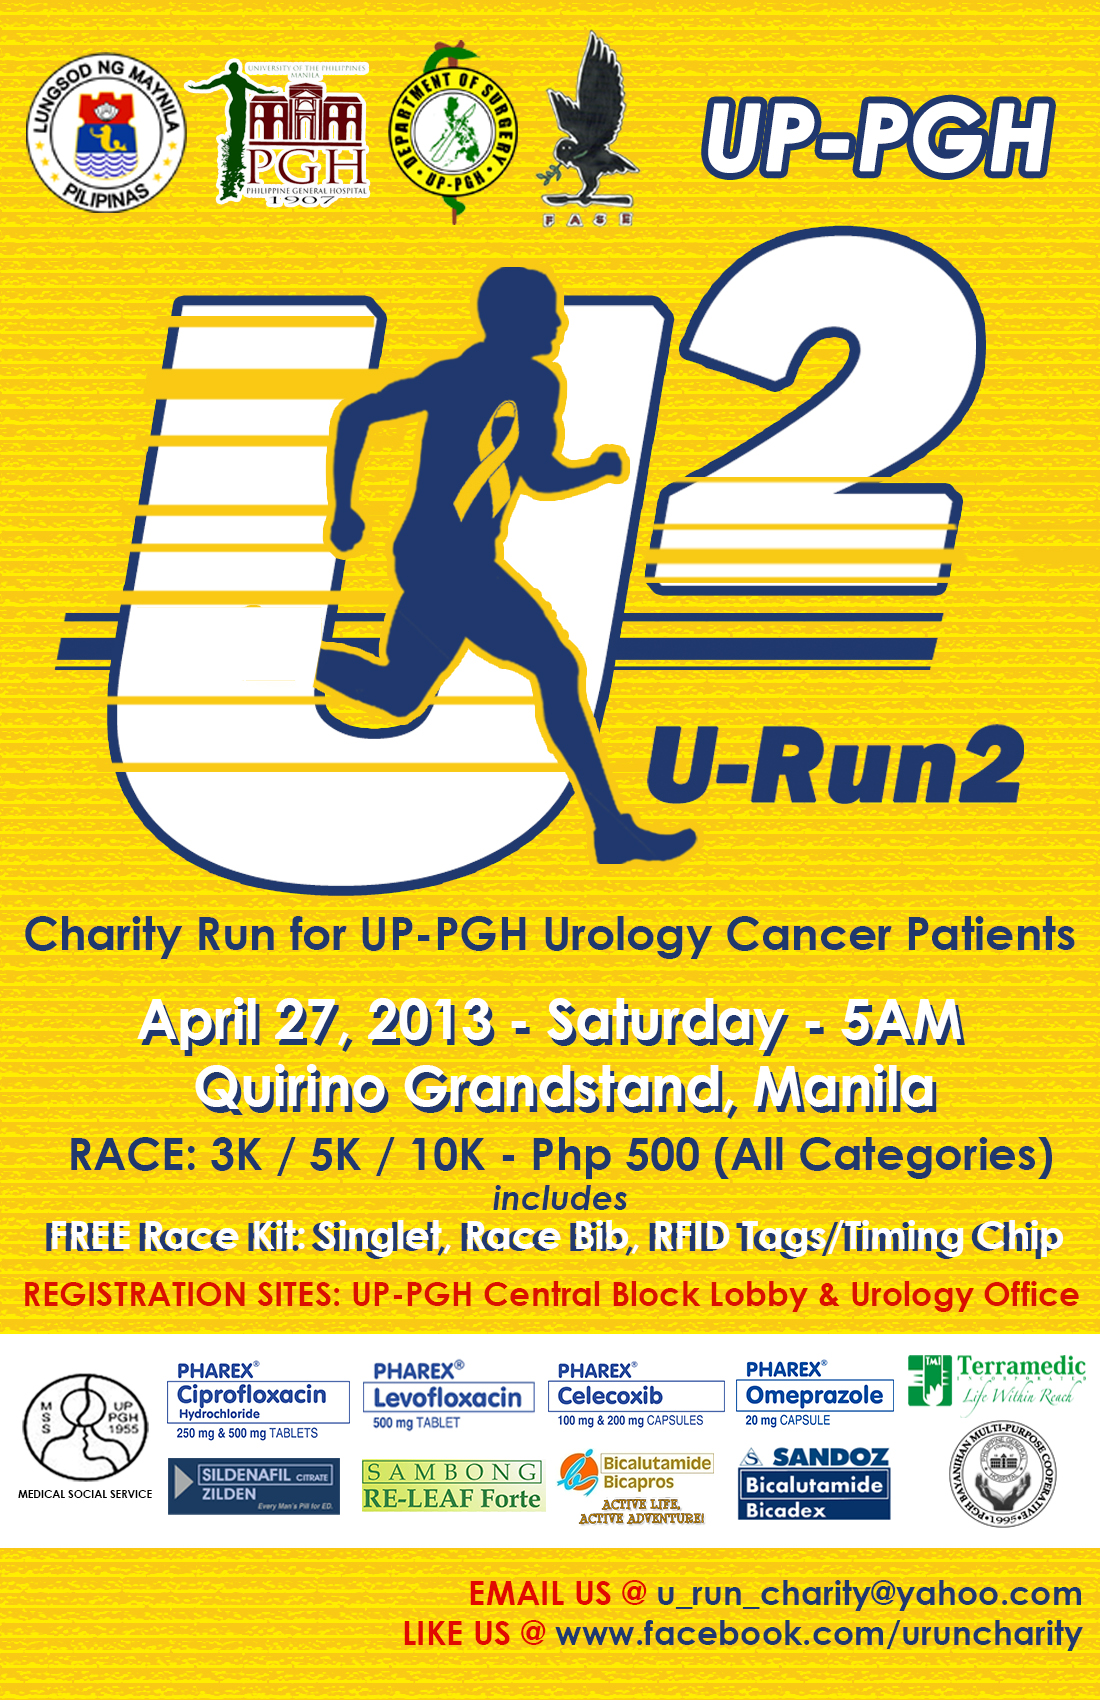 u-run2-2013-poster